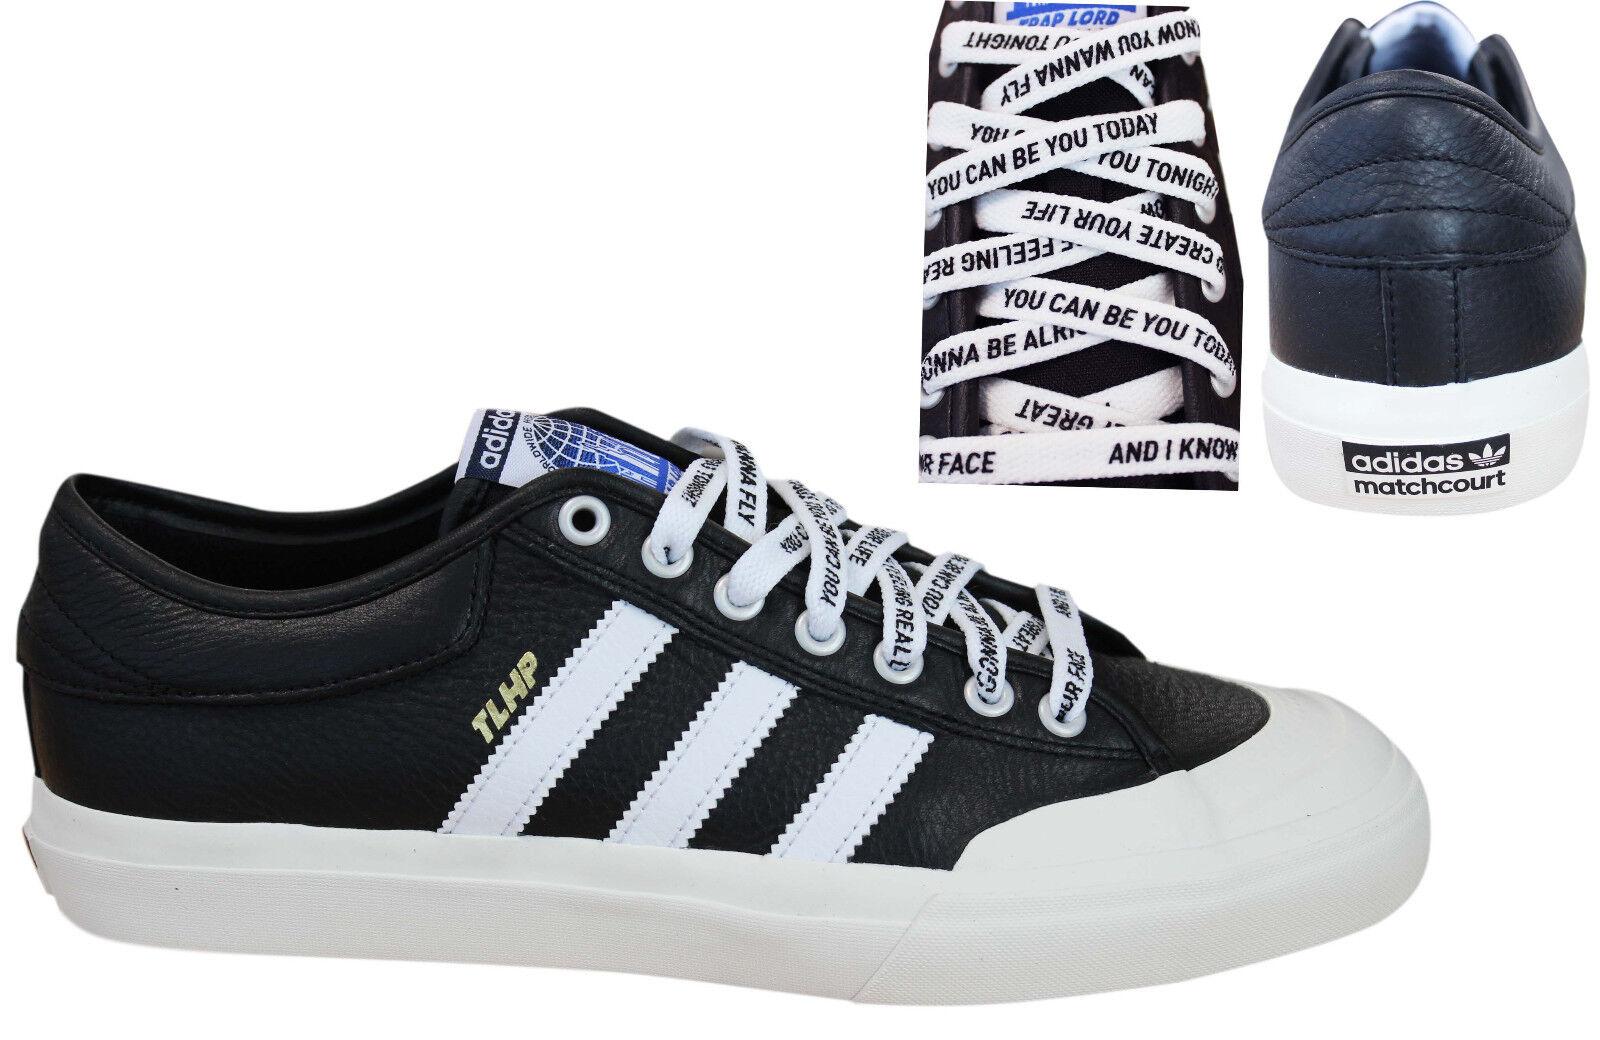 Adidas Originals Matchcourt X Trap Lord Mens Trainers Lace Up shoes CG5614 D6